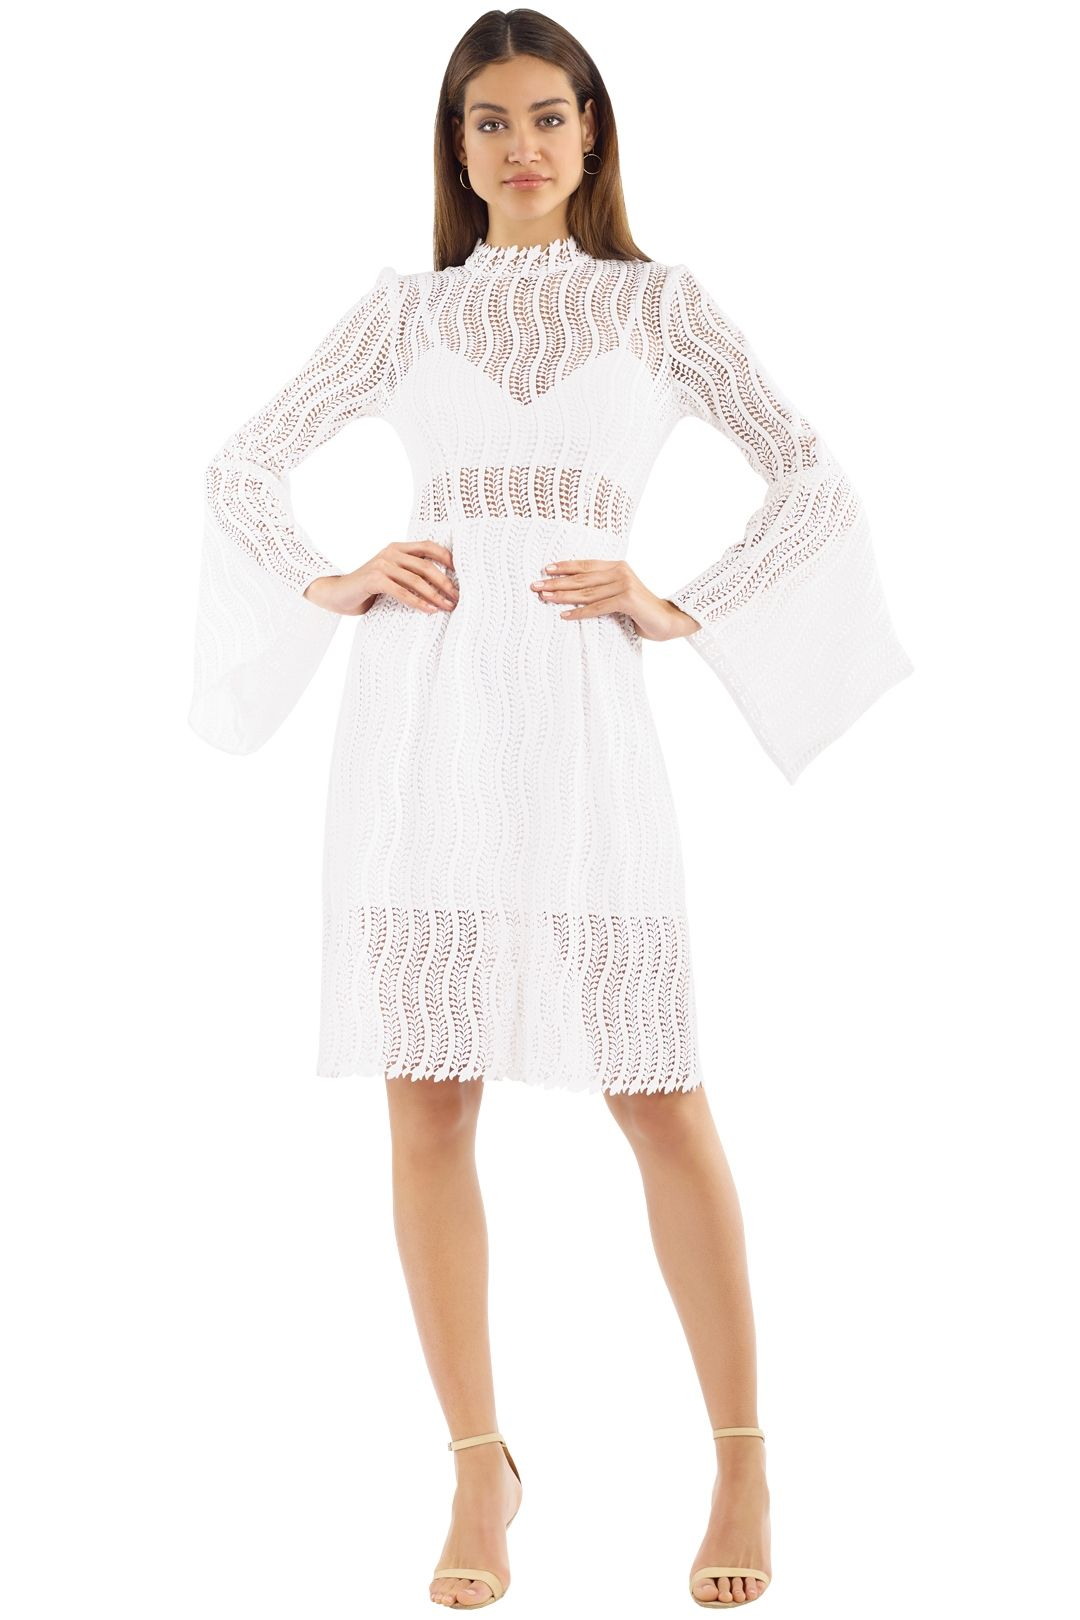 Yeojin Bae - Caterina Dress - Cream - Front